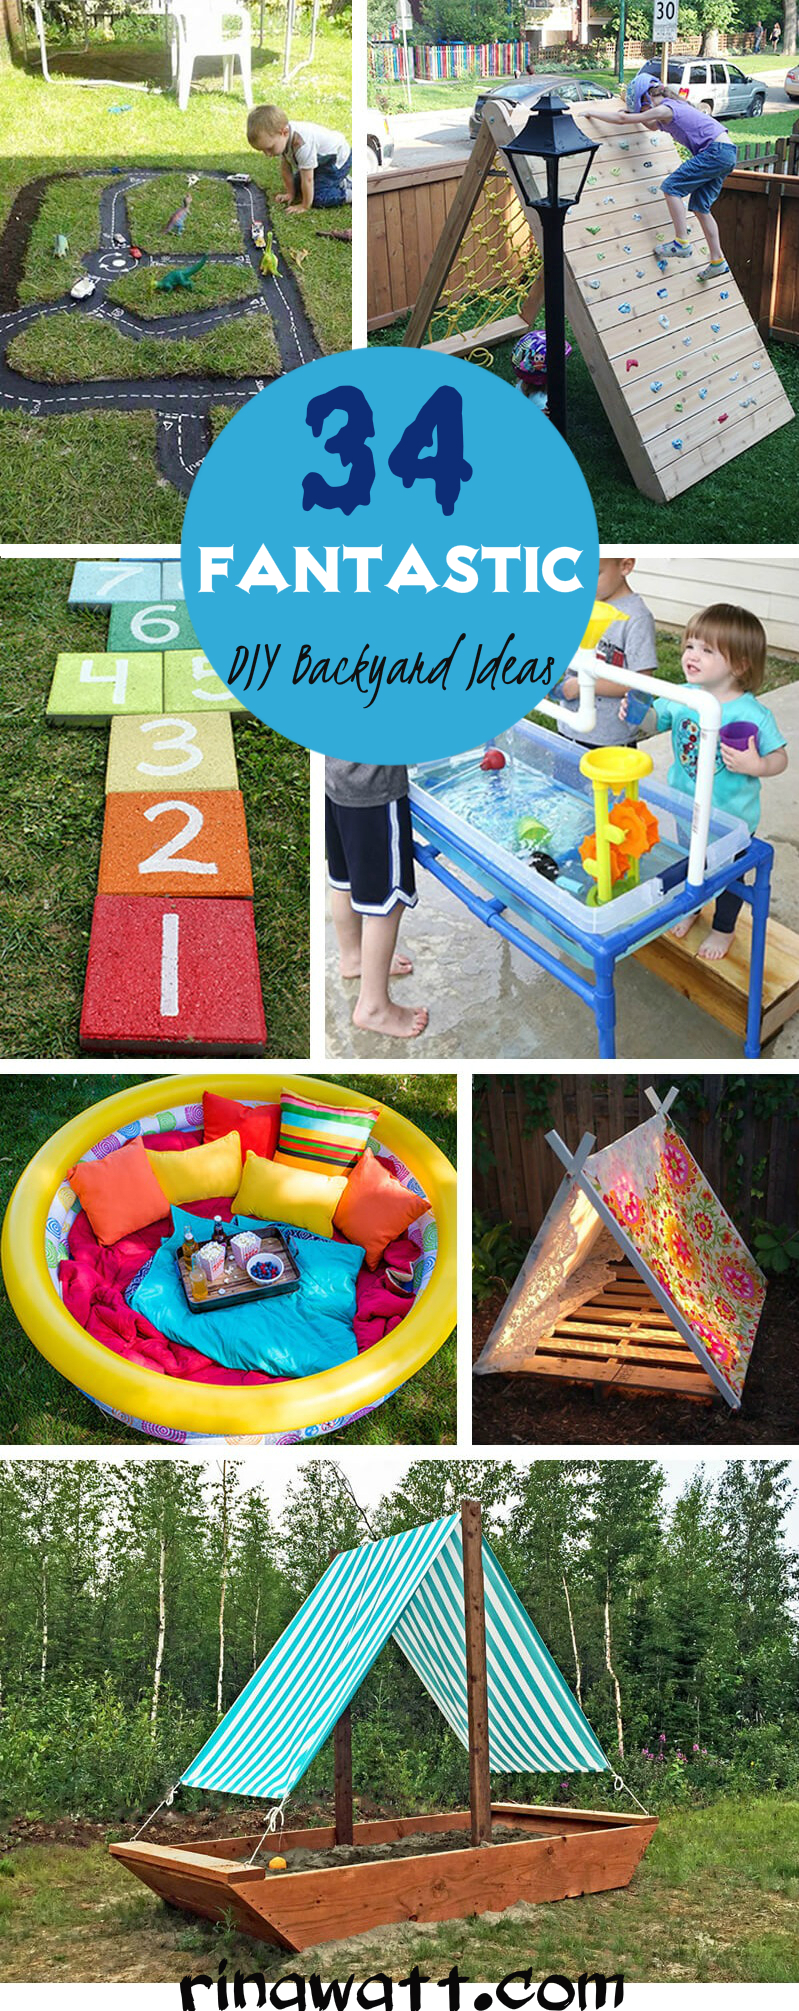 34 Fantastic Diy Backyard Ideas For Kids That Are Easy To Make Rina Watt Blogger Home Decor And Recipes